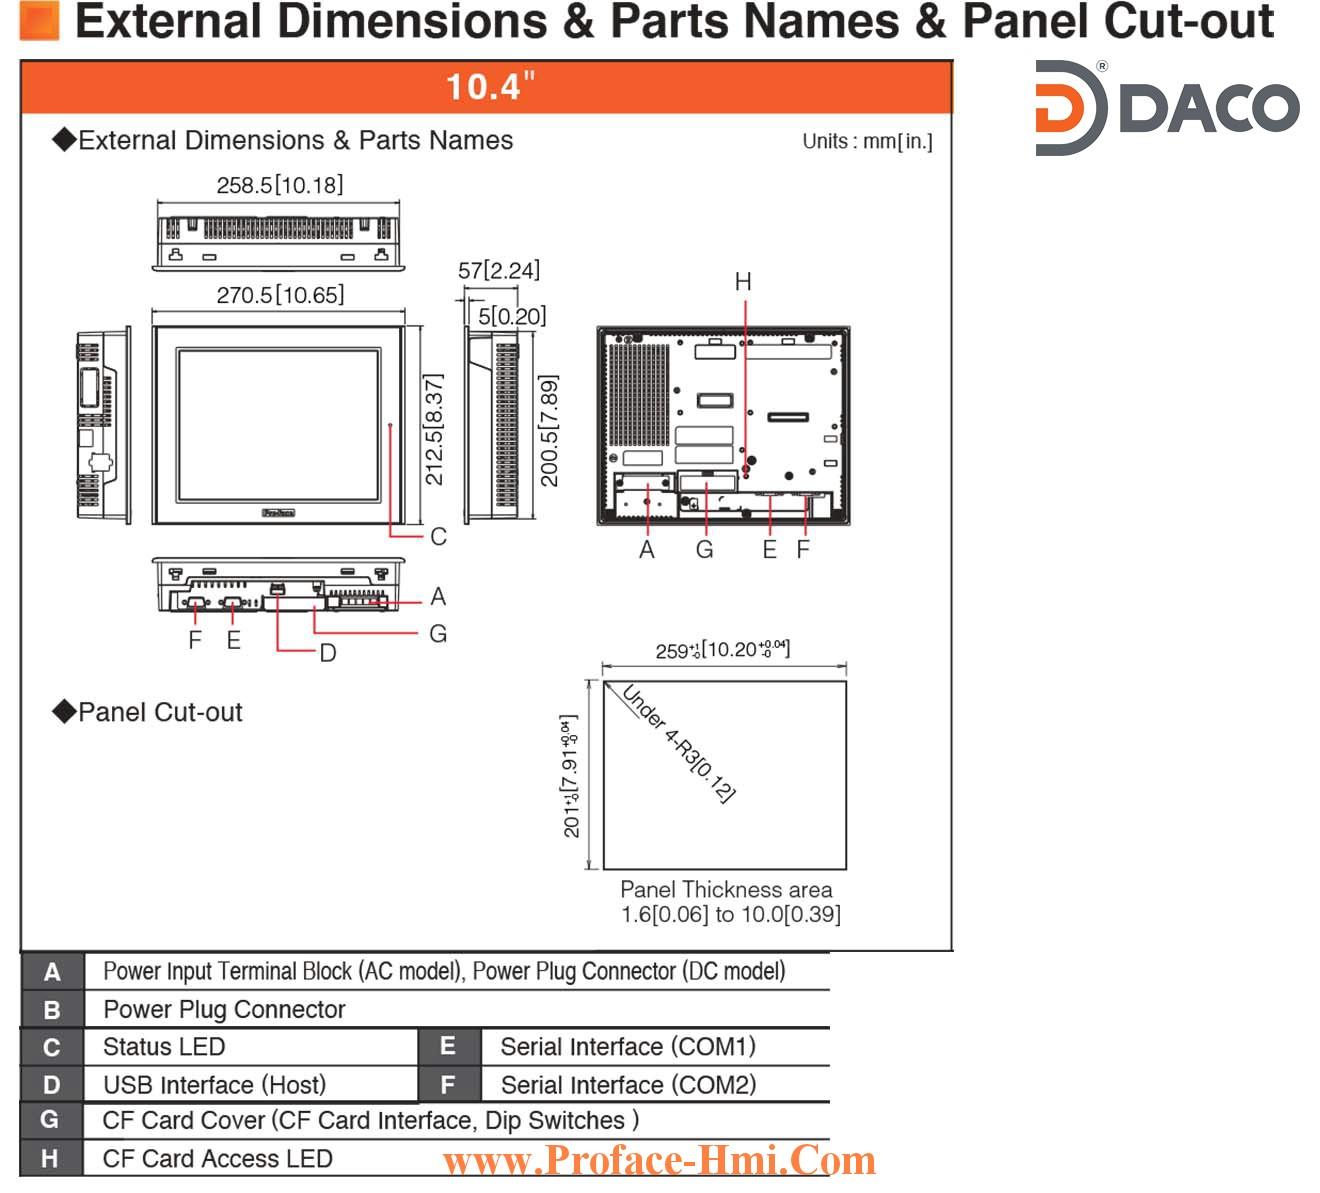 Man hinh cam ung hmi Proface ST3501-Dimensions